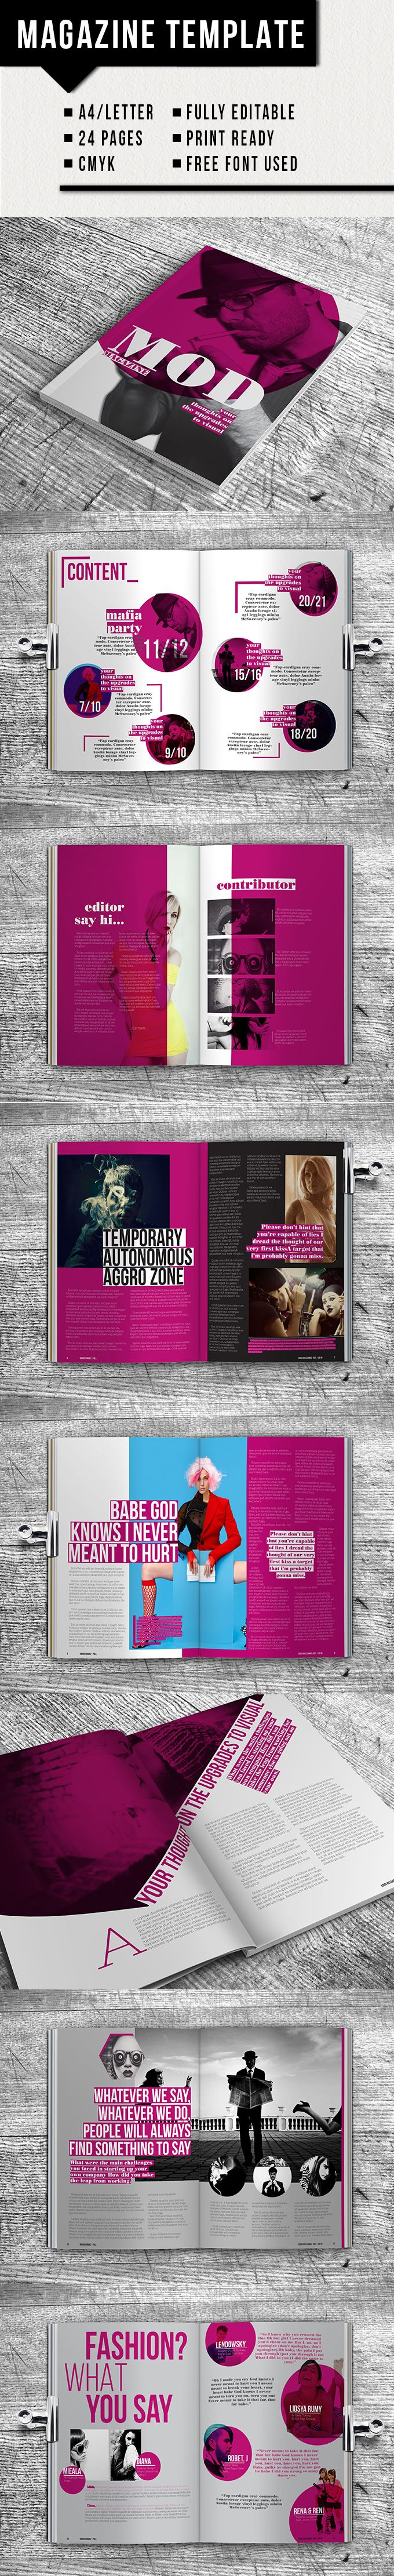 #editorial #magazine